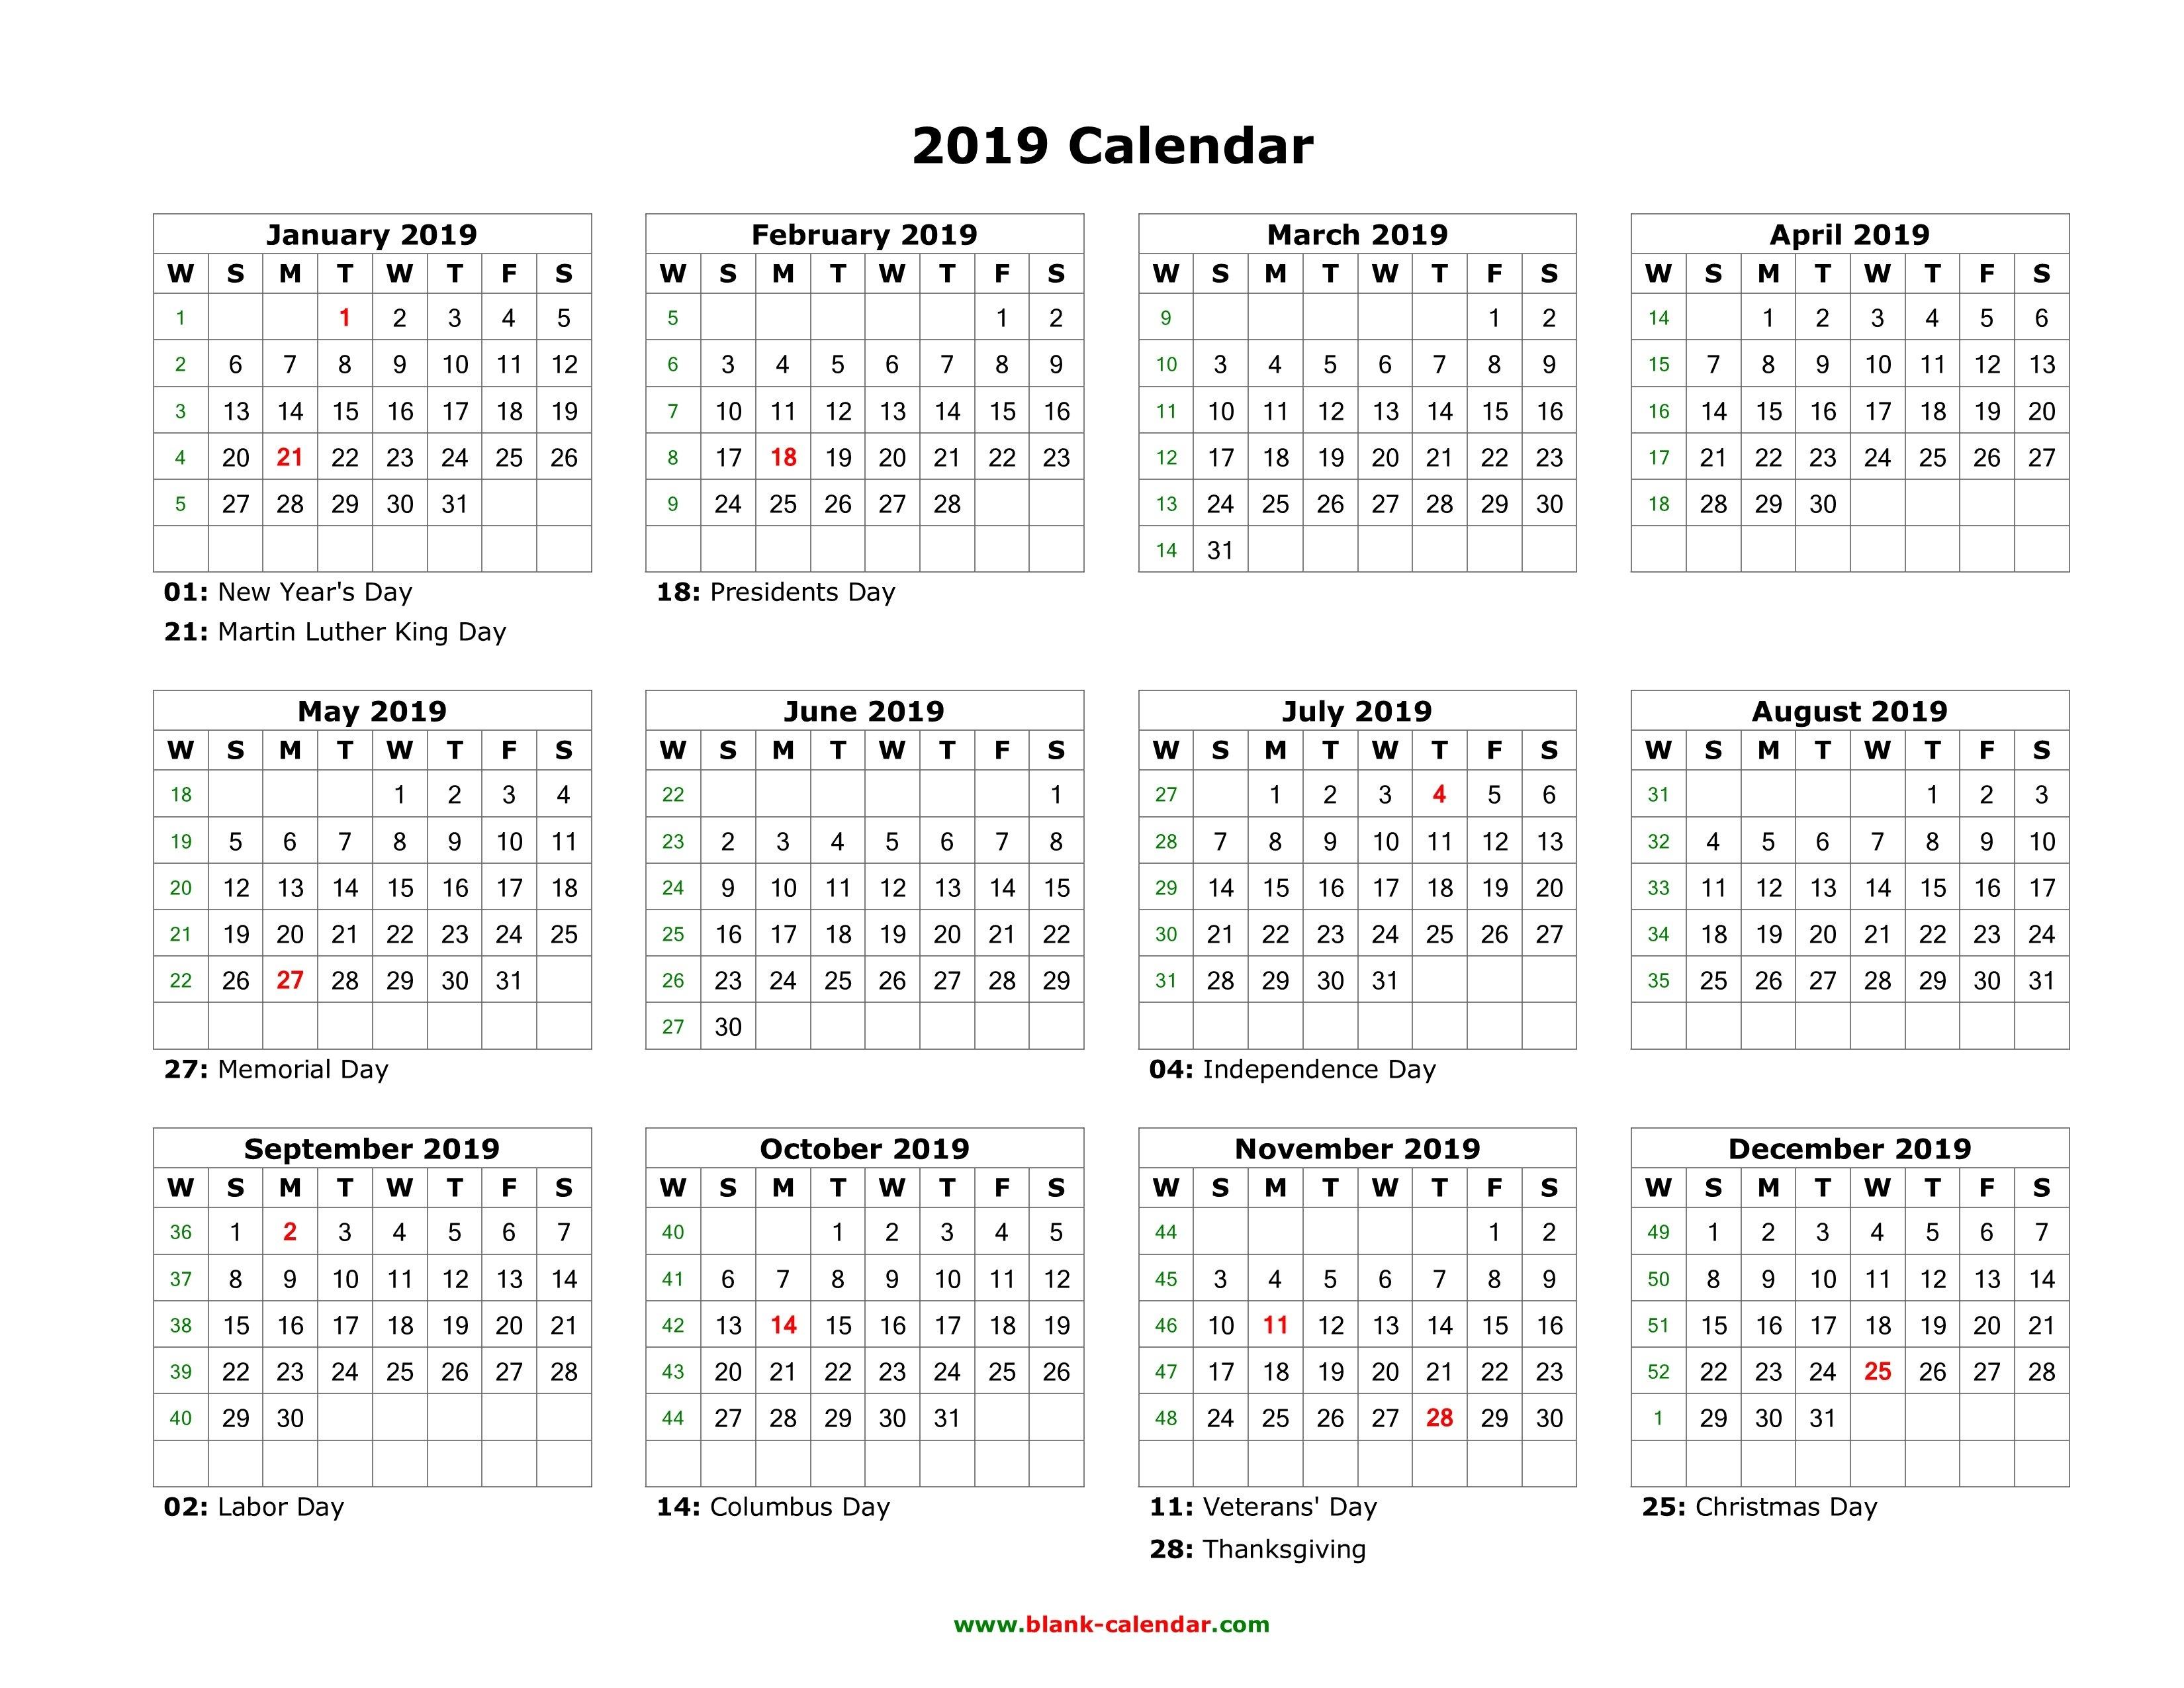 Blank Calendar 2019   Free Download Calendar Templates Calendar 2019 Print Free